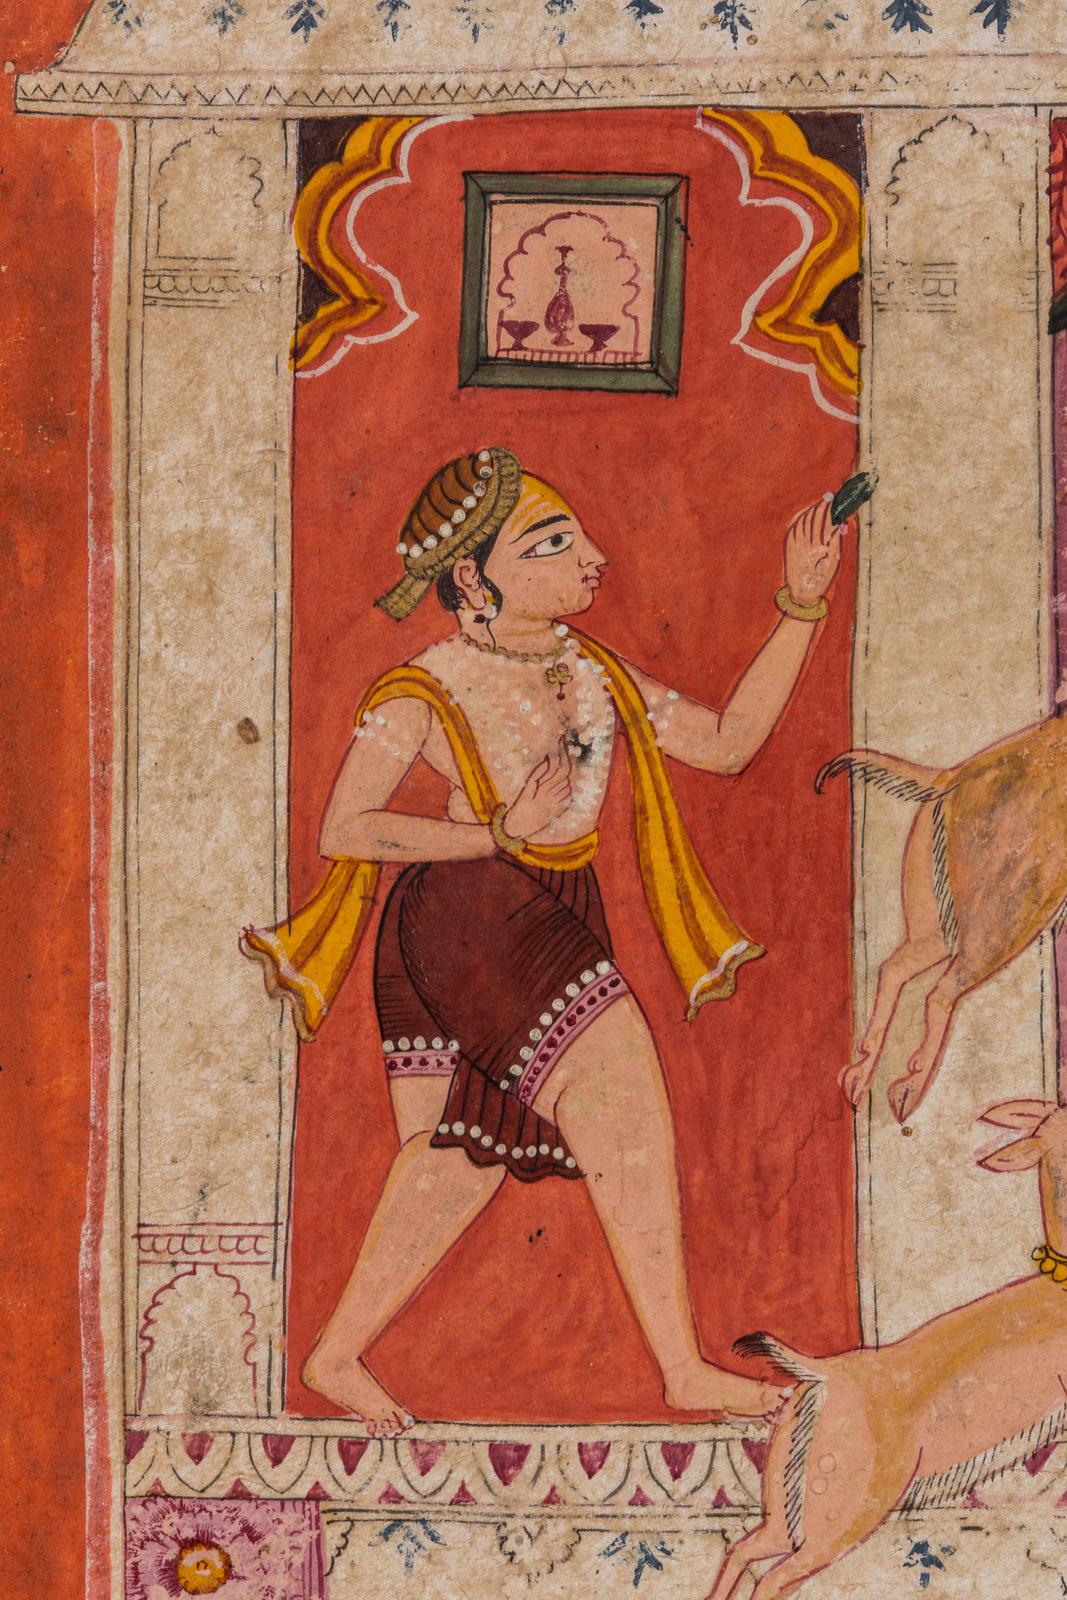 INDIA - Image 3 of 6